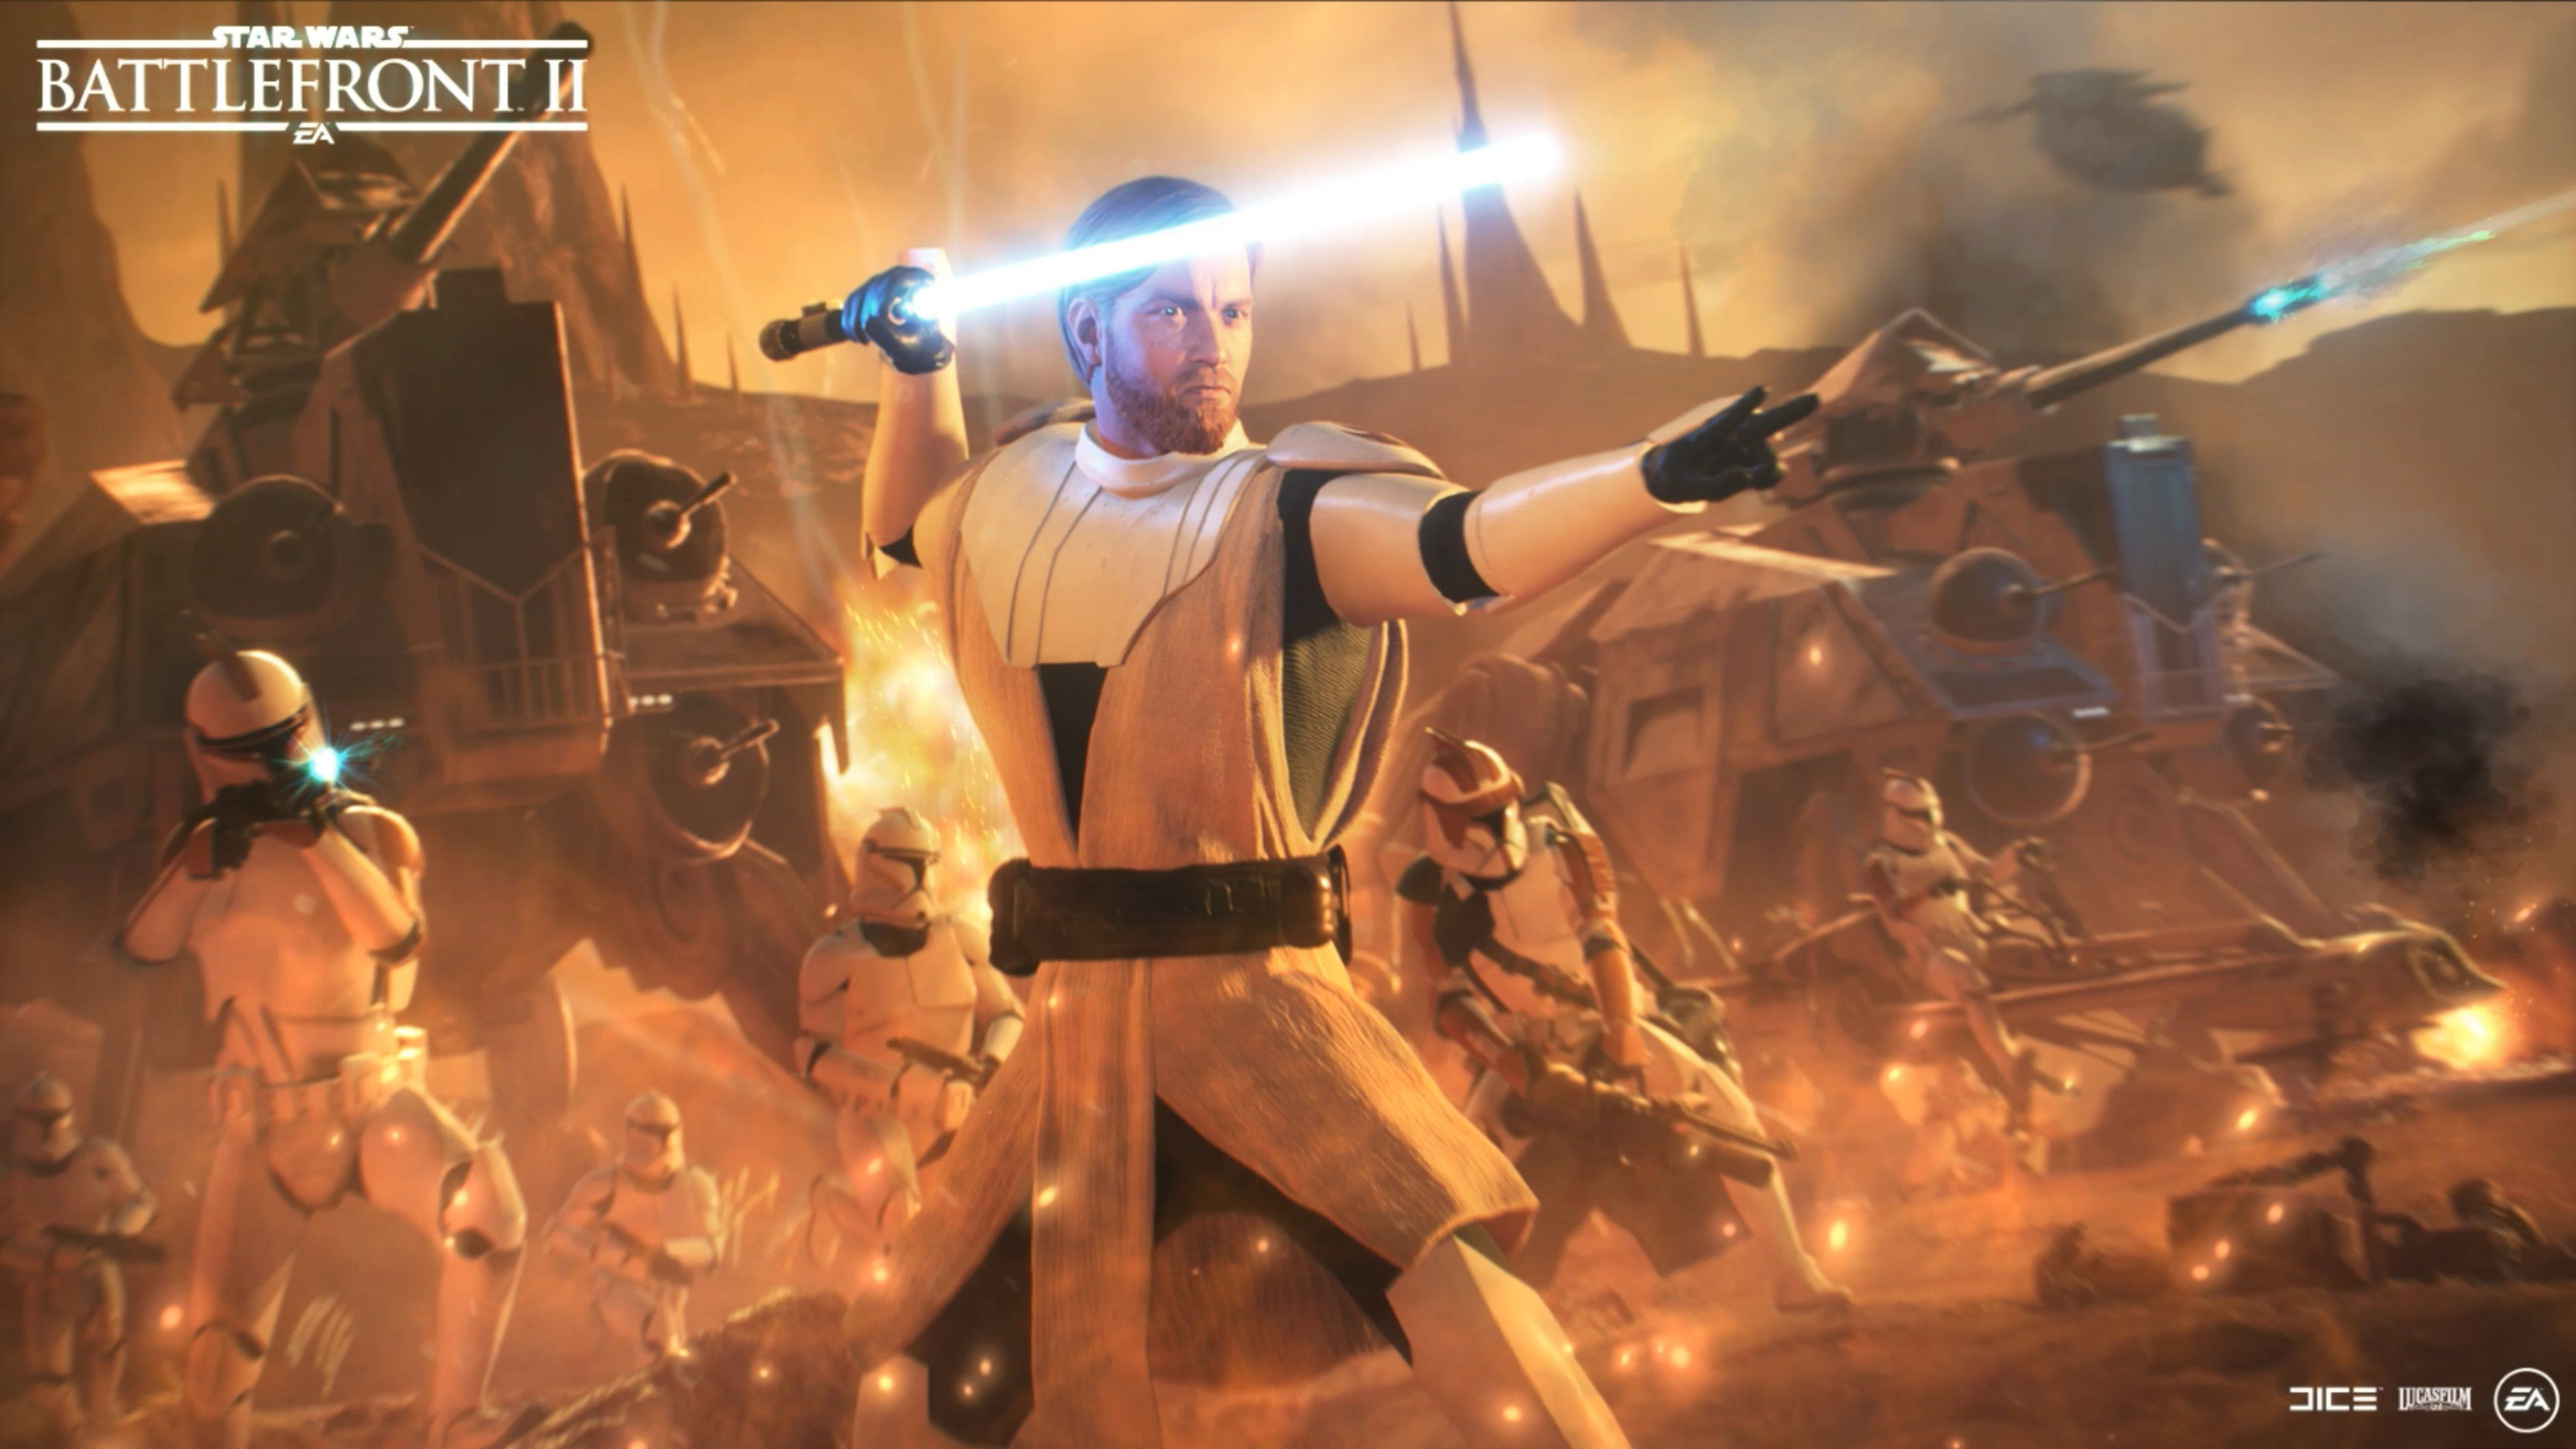 Obi Wan Kenobi Promotional Art Live Wallpaper